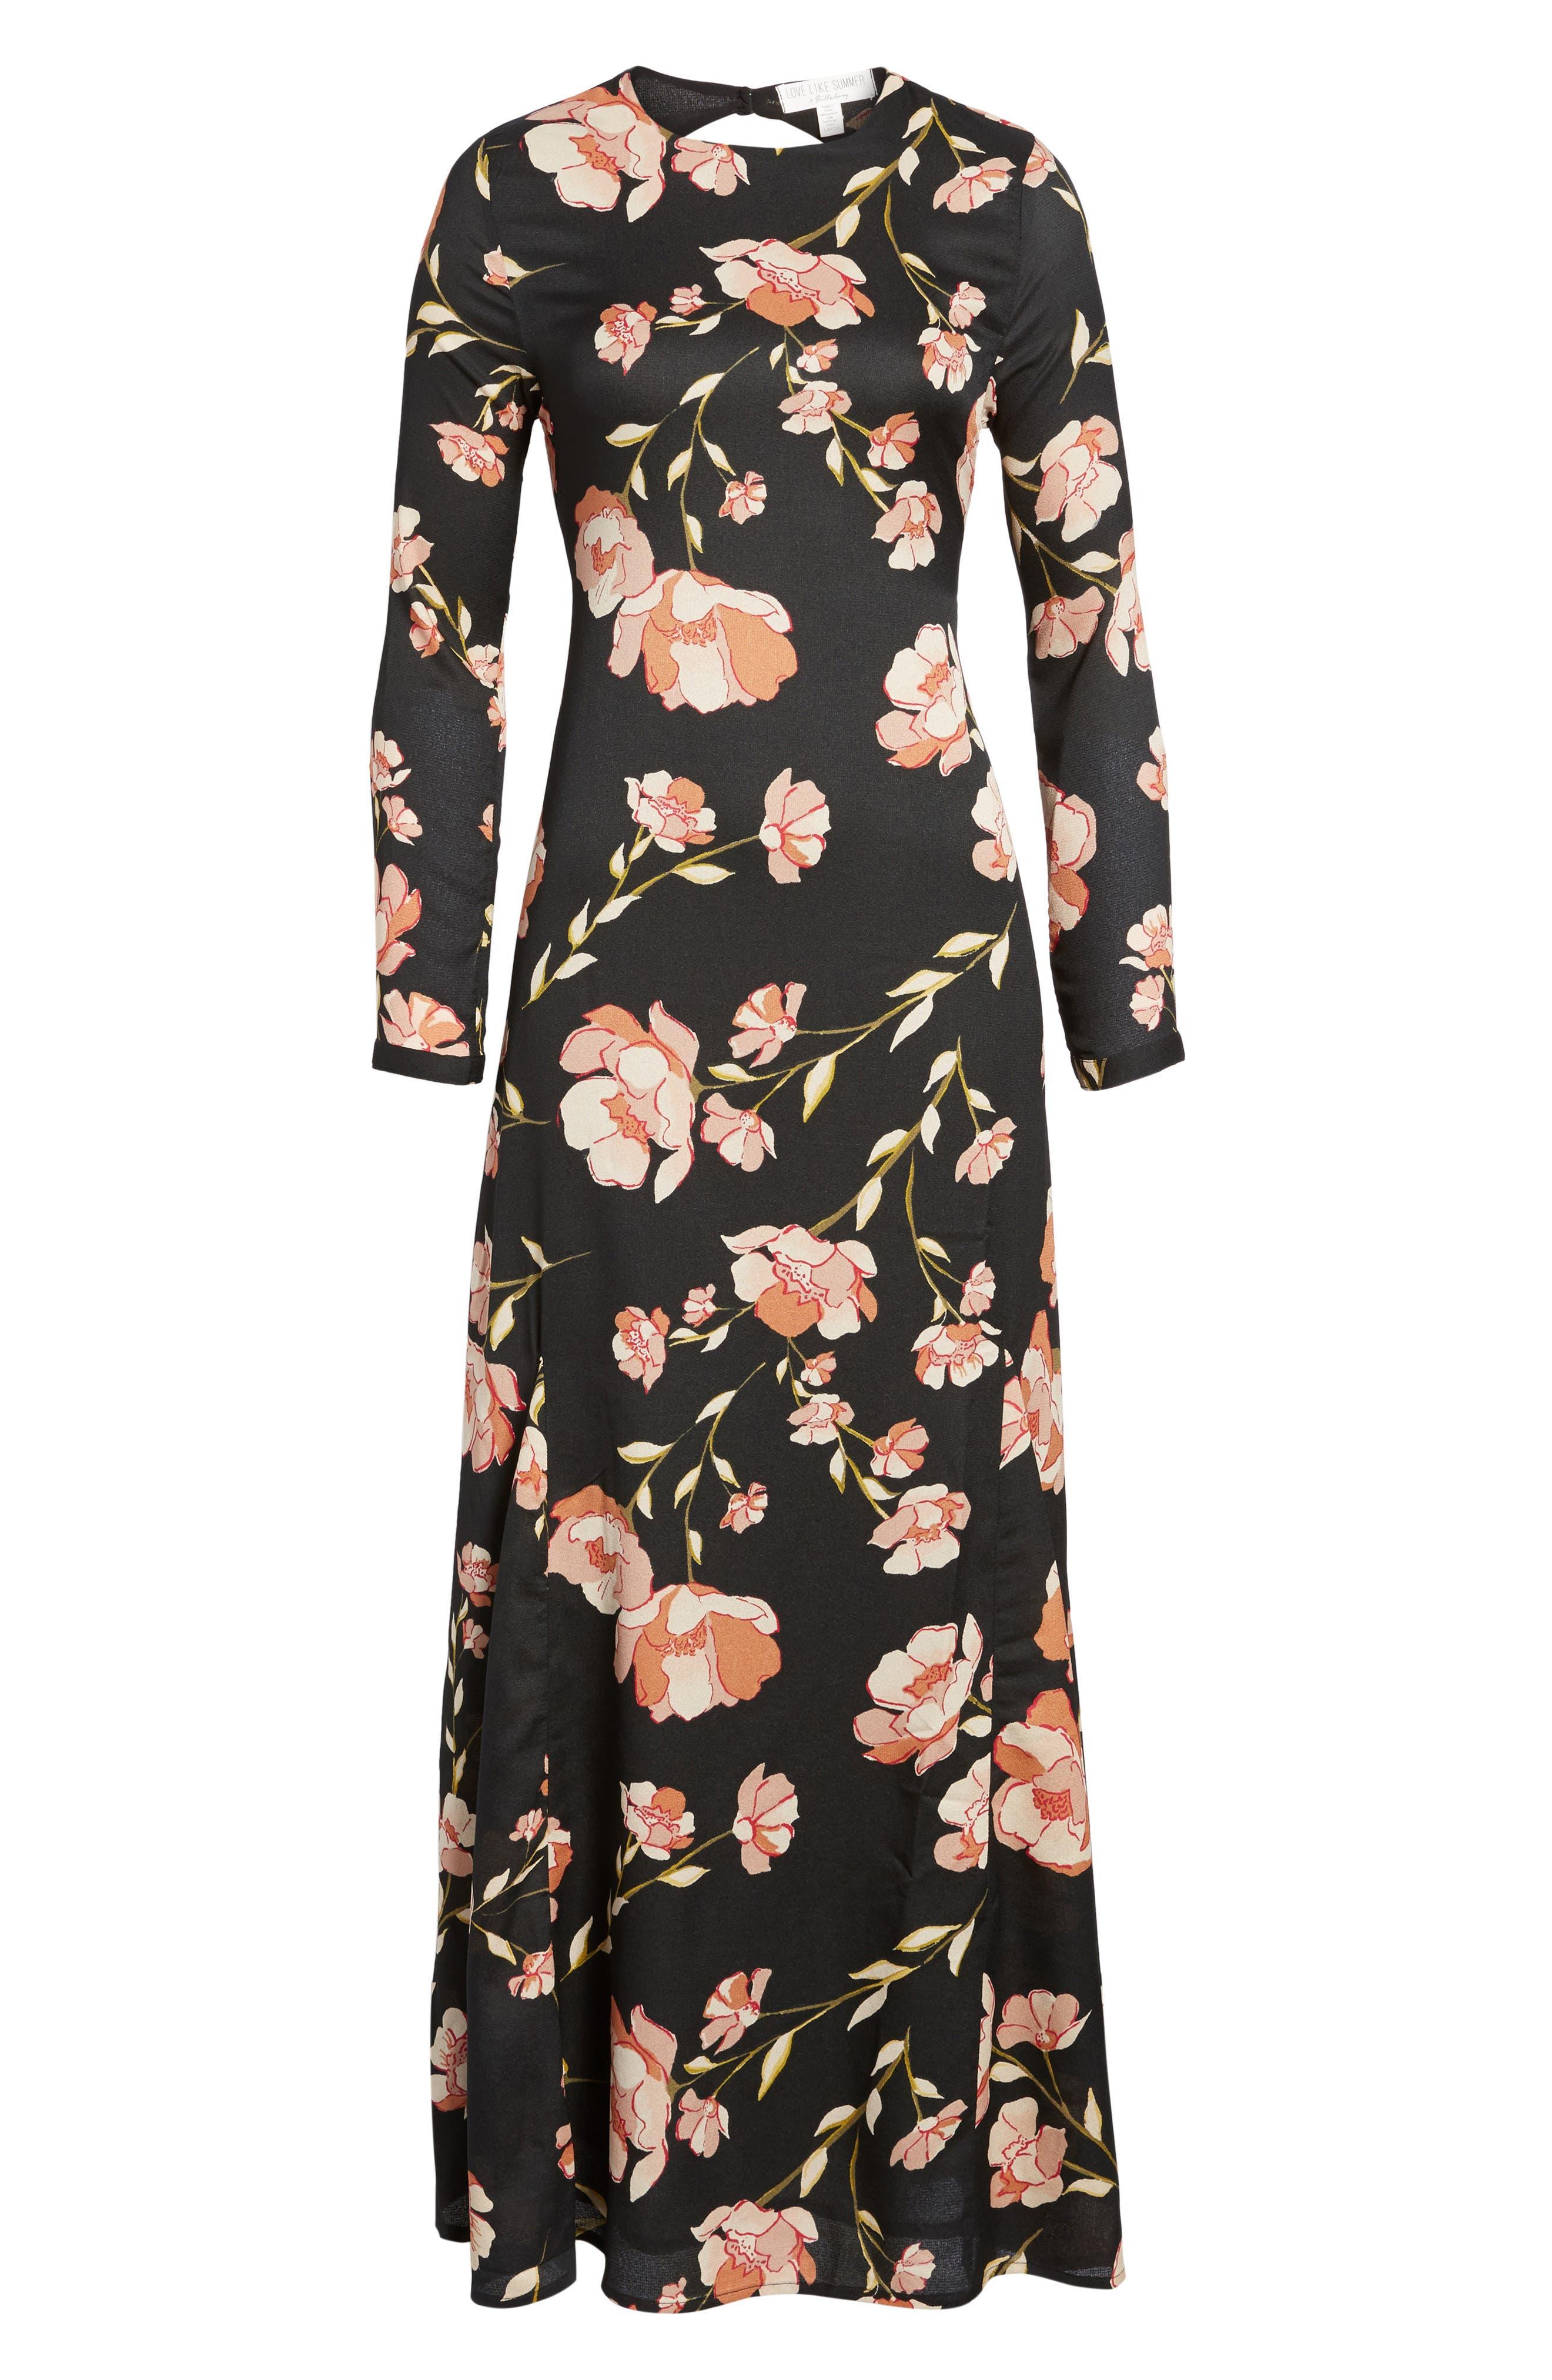 Floral Print Maxi Dress,                             Alternate thumbnail 7, color,                             001